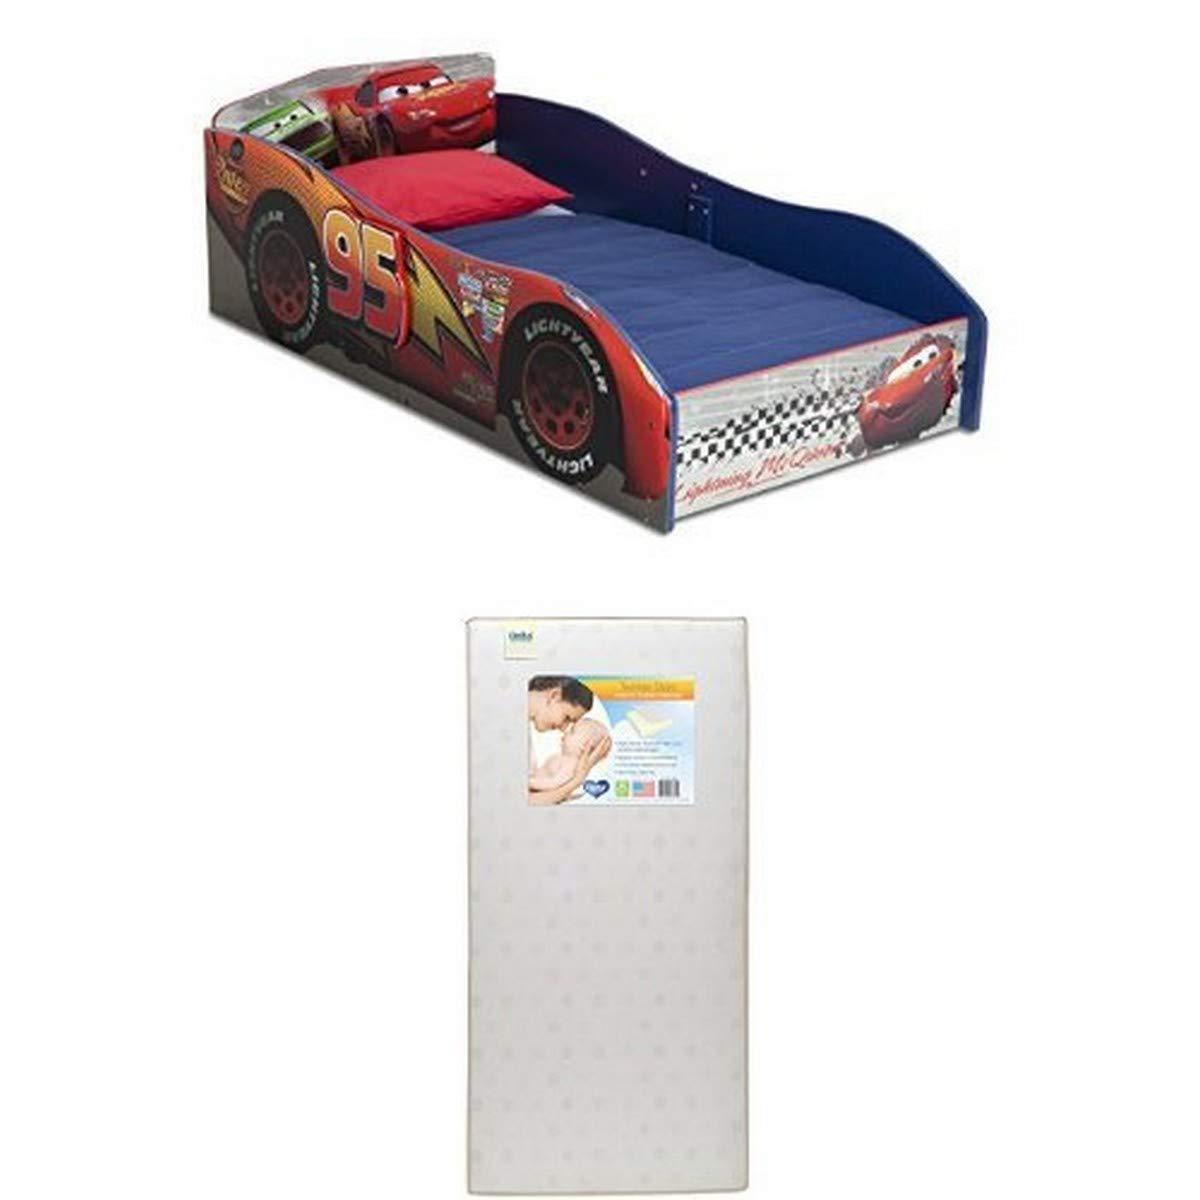 Delta Children Disney/Pixar Cars Wood Toddler Bed with Twinkle Stars Crib & Toddler Mattress